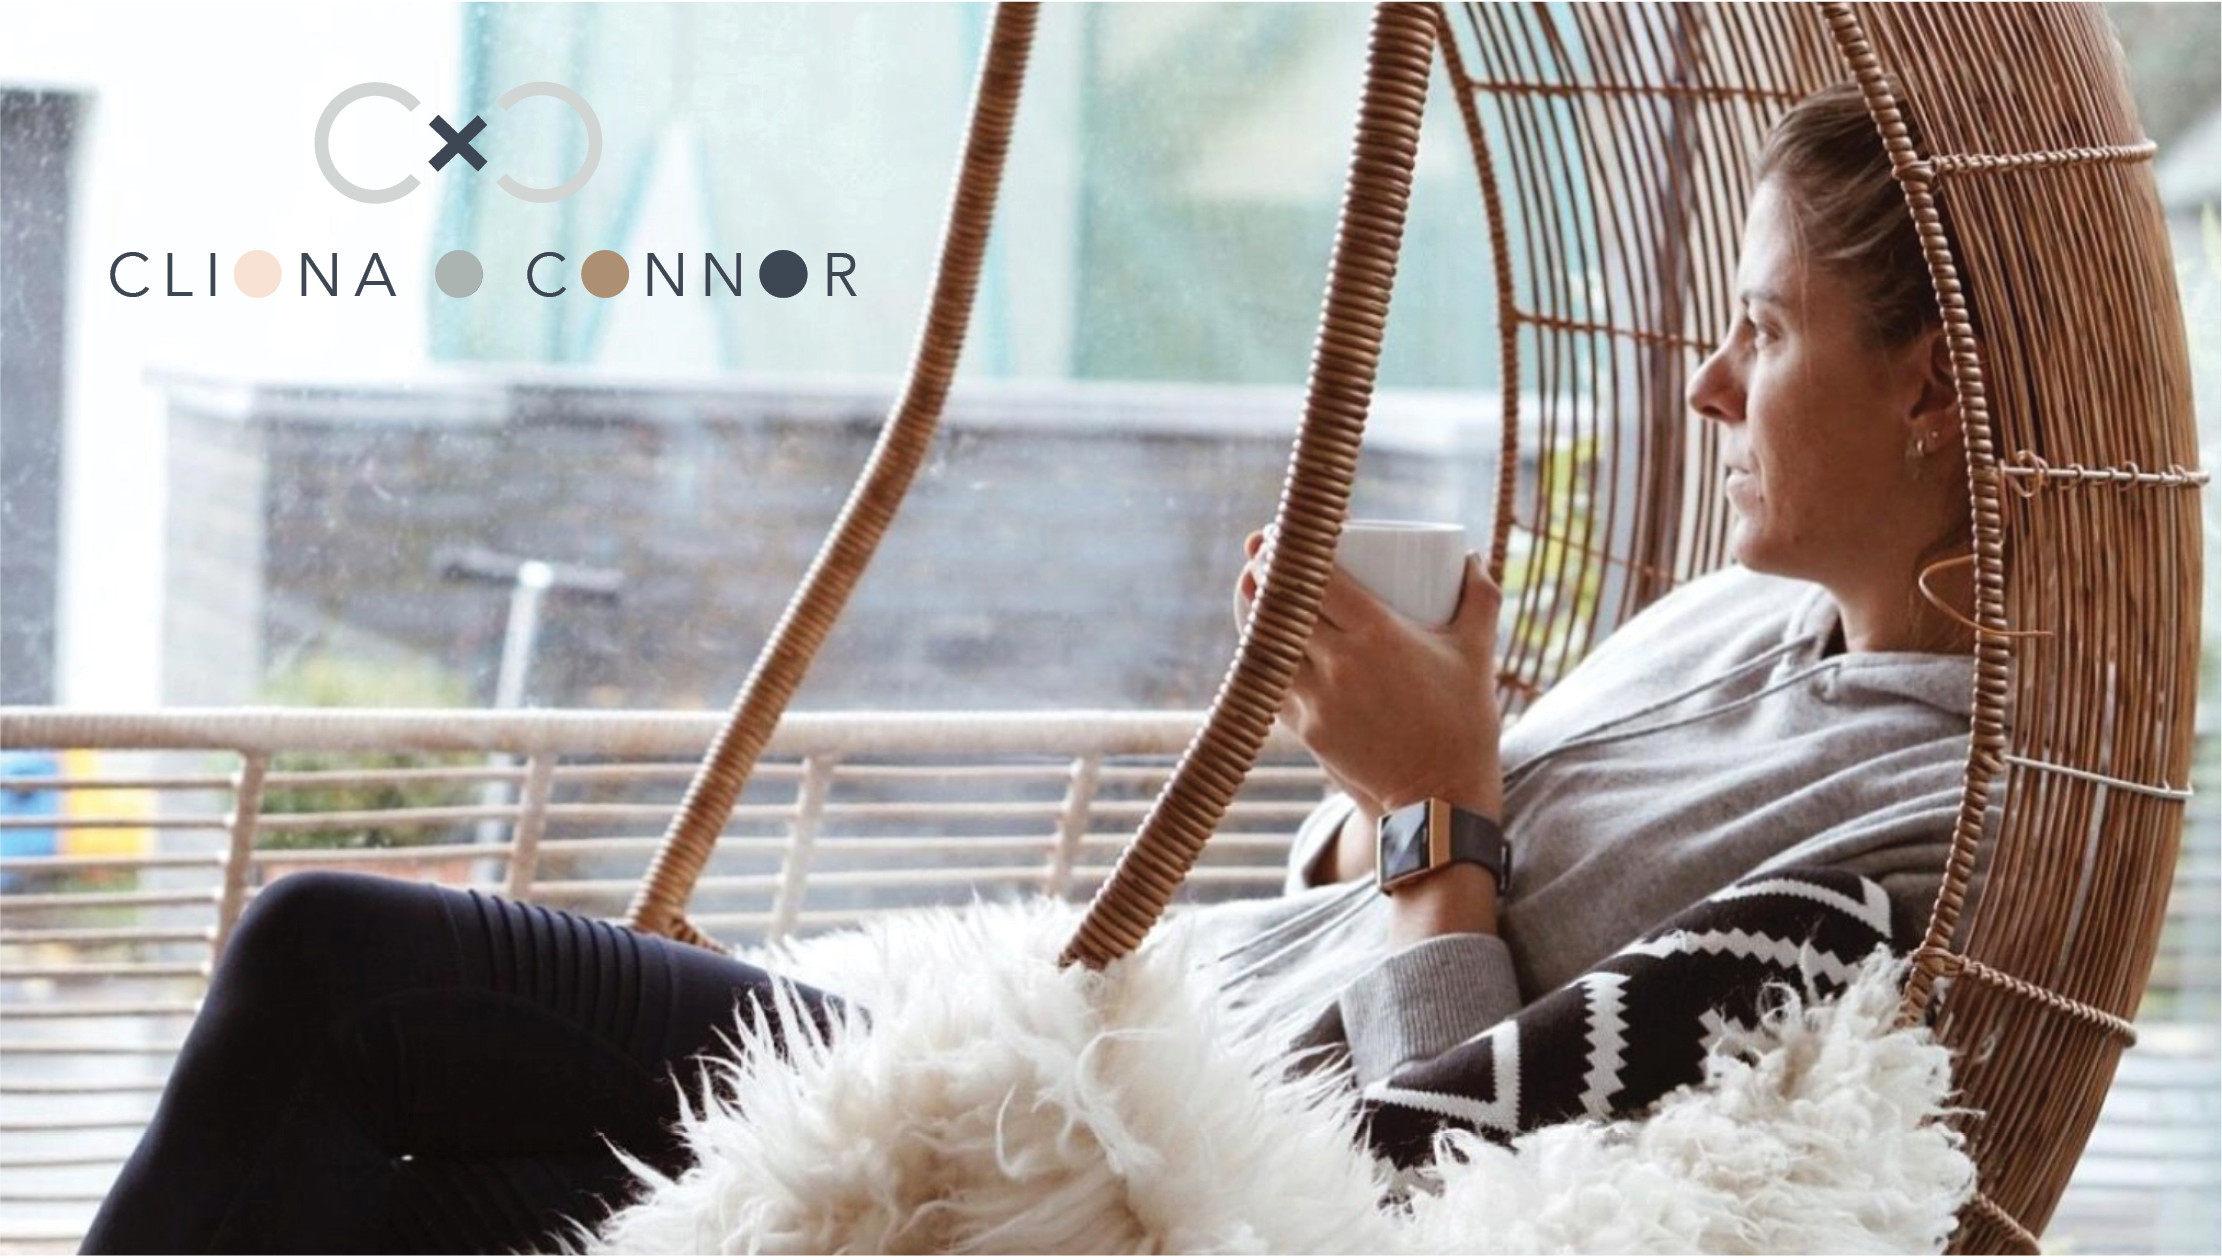 Limelight Media Cork   Cliona O'Connor   PR agency, Branding, Advertising,  Cork